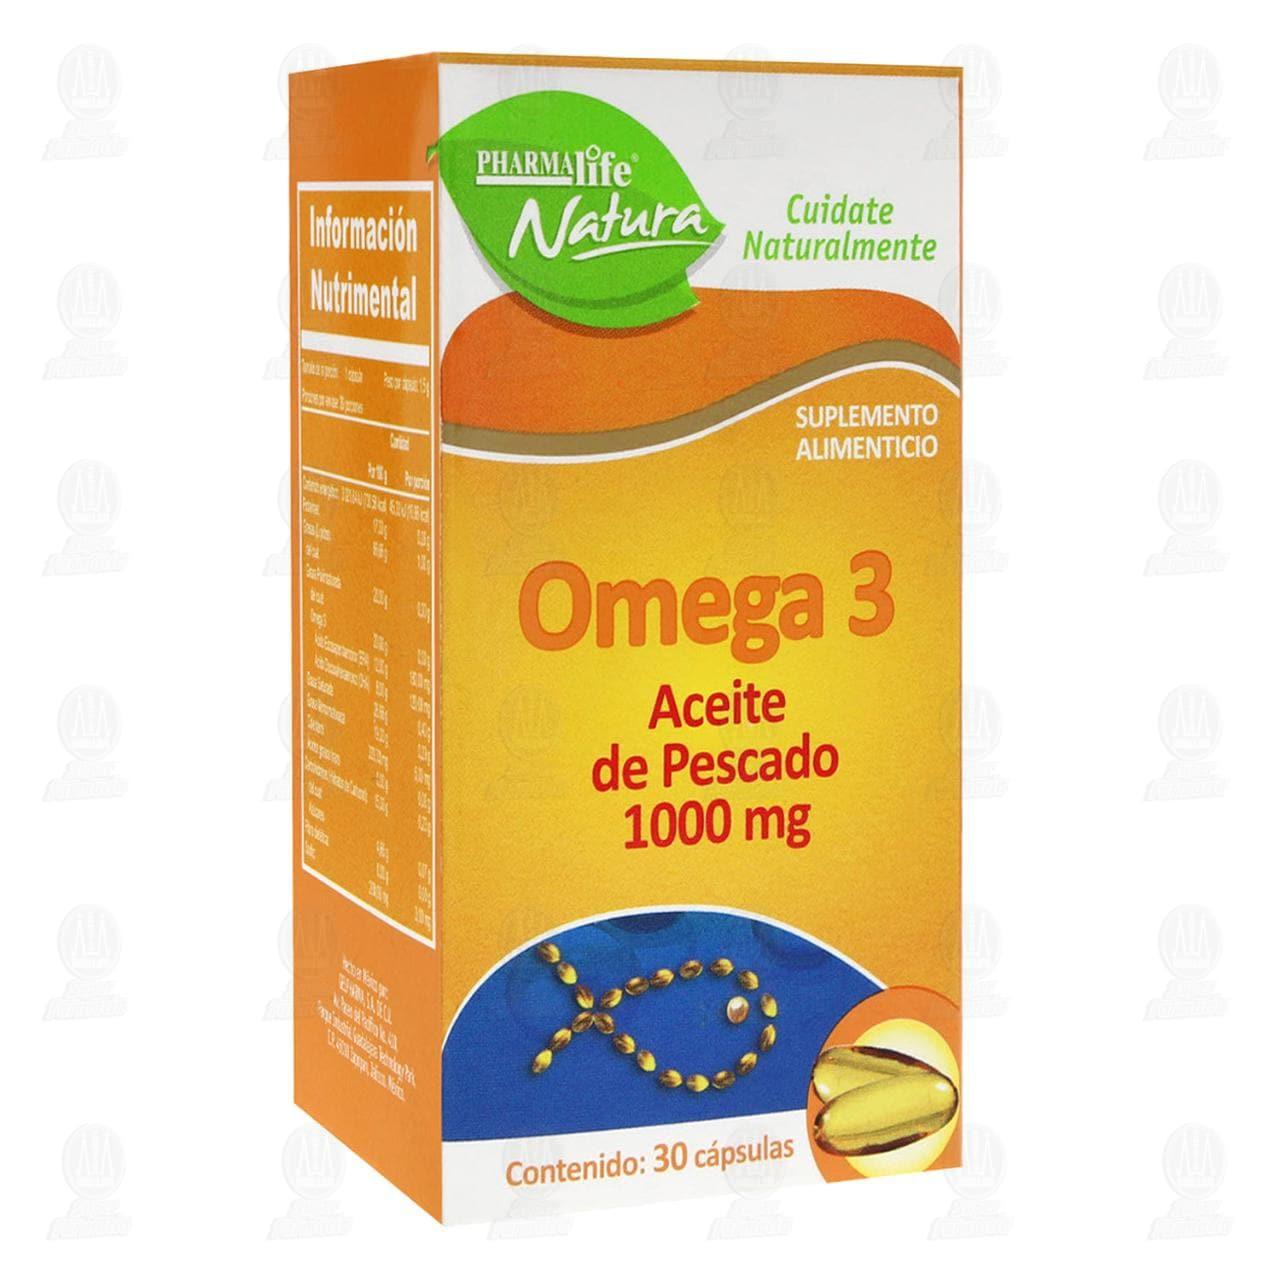 Comprar Omega 3 1000mg 30 Cápsulas Pharmalife Natura en Farmacias Guadalajara